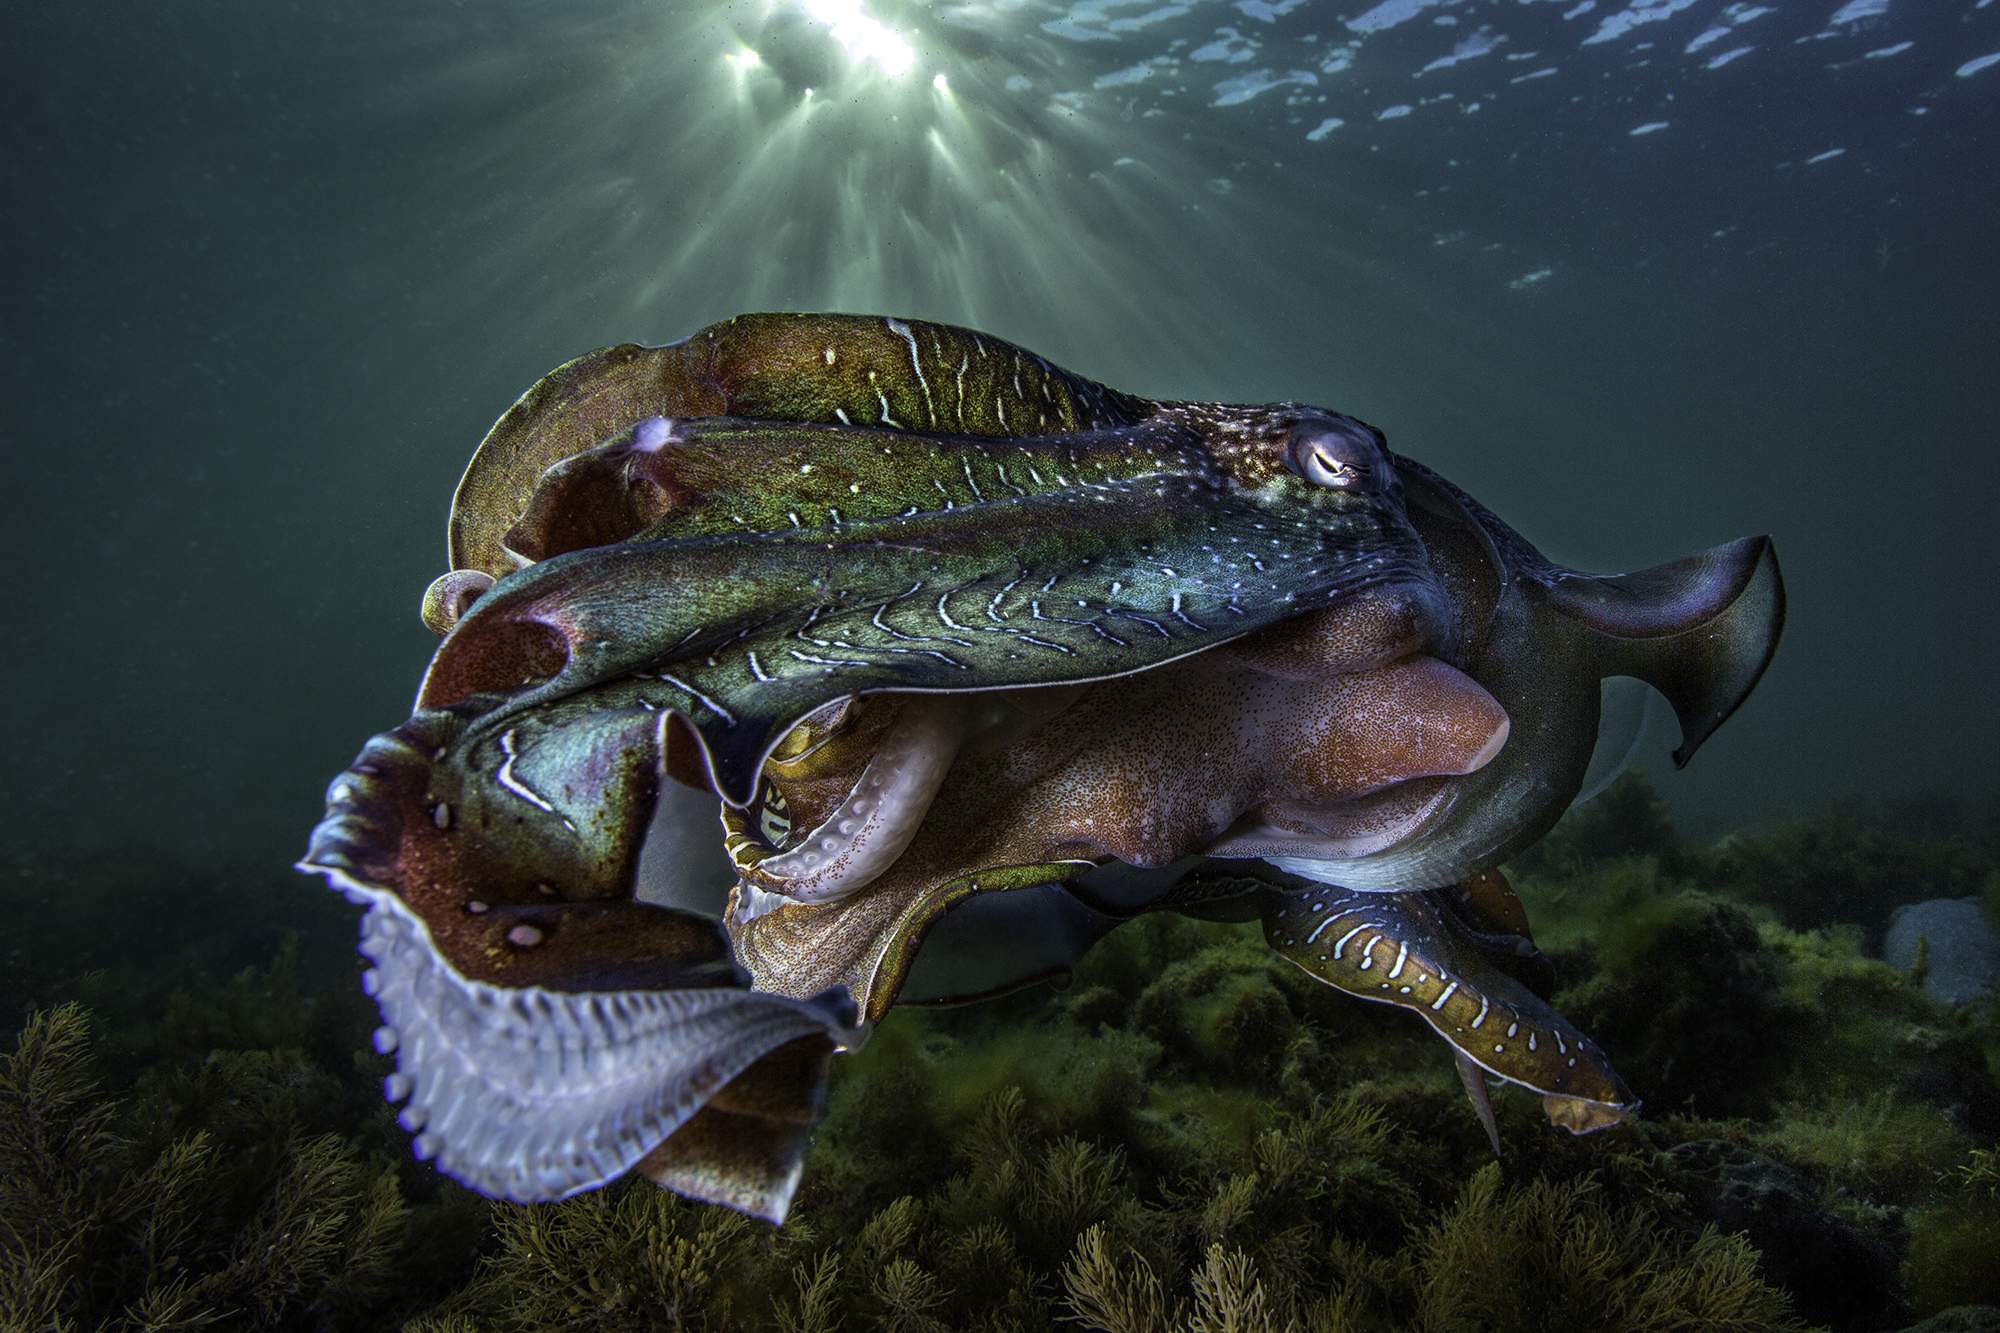 Portelli_Scott_Cuttlefish.jpg